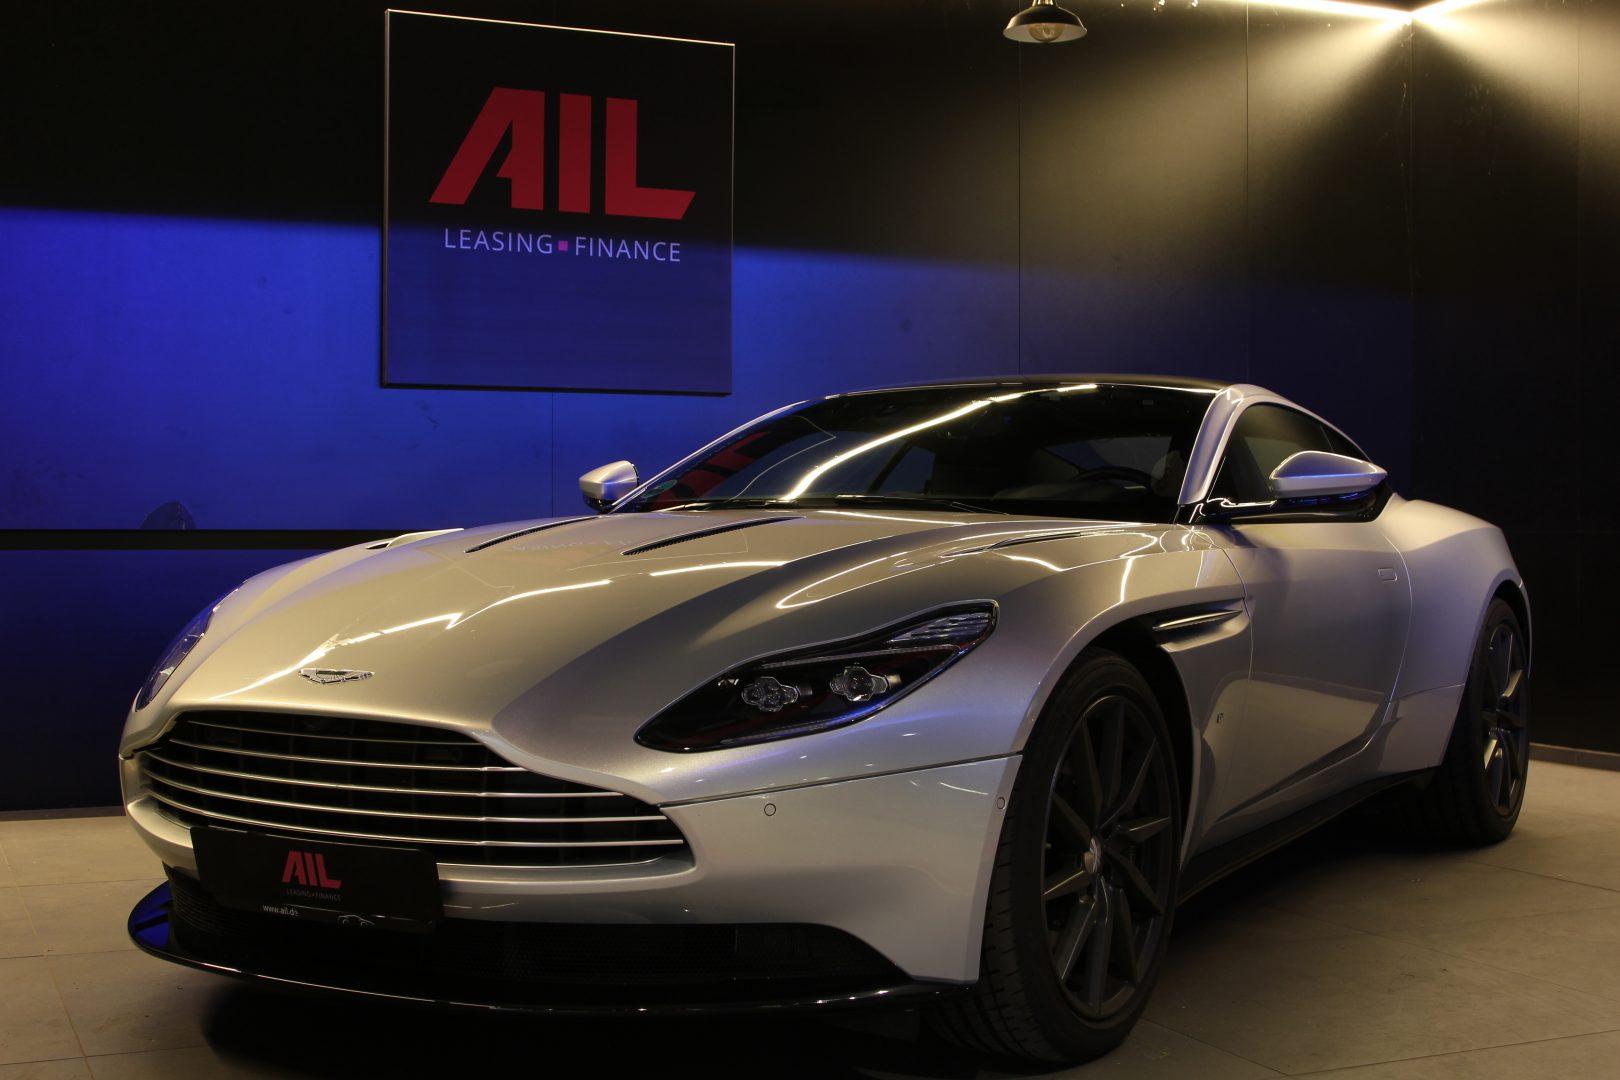 AIL Aston Martin DB11 Coupe 5.2 V12 5